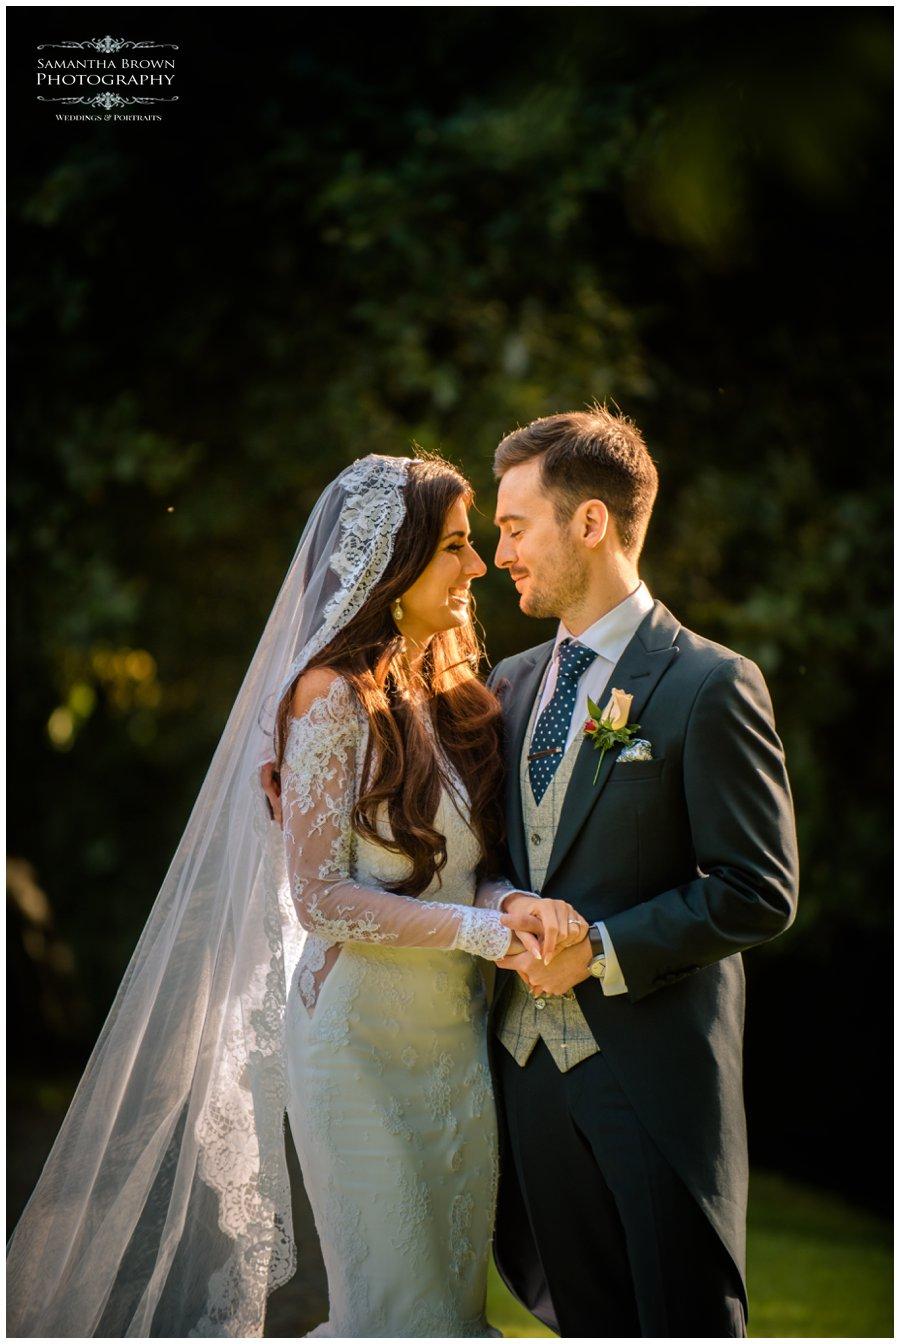 Mitton Hall Wedding Lauretta & Ash's Mitton Hall Wedding took place on the 22nd September 2016.